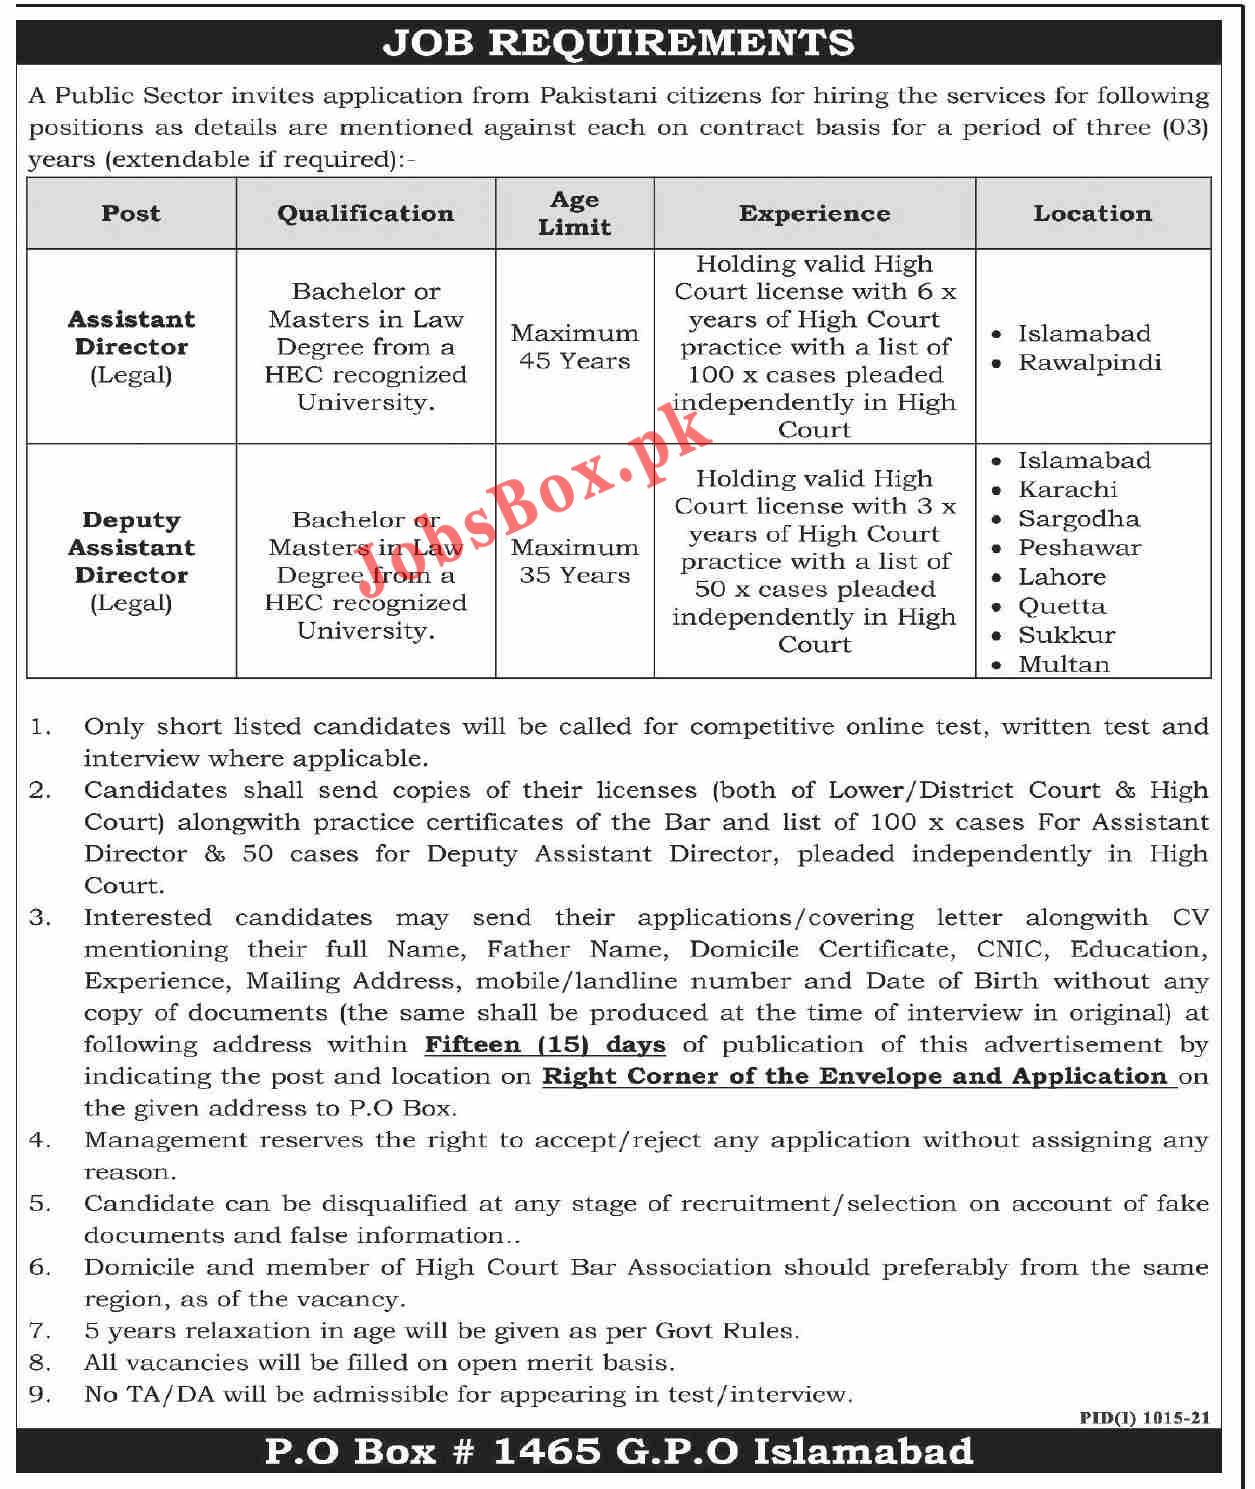 Public Sector Organization PO Box No 1465 GPO Islamabad Jobs 2021